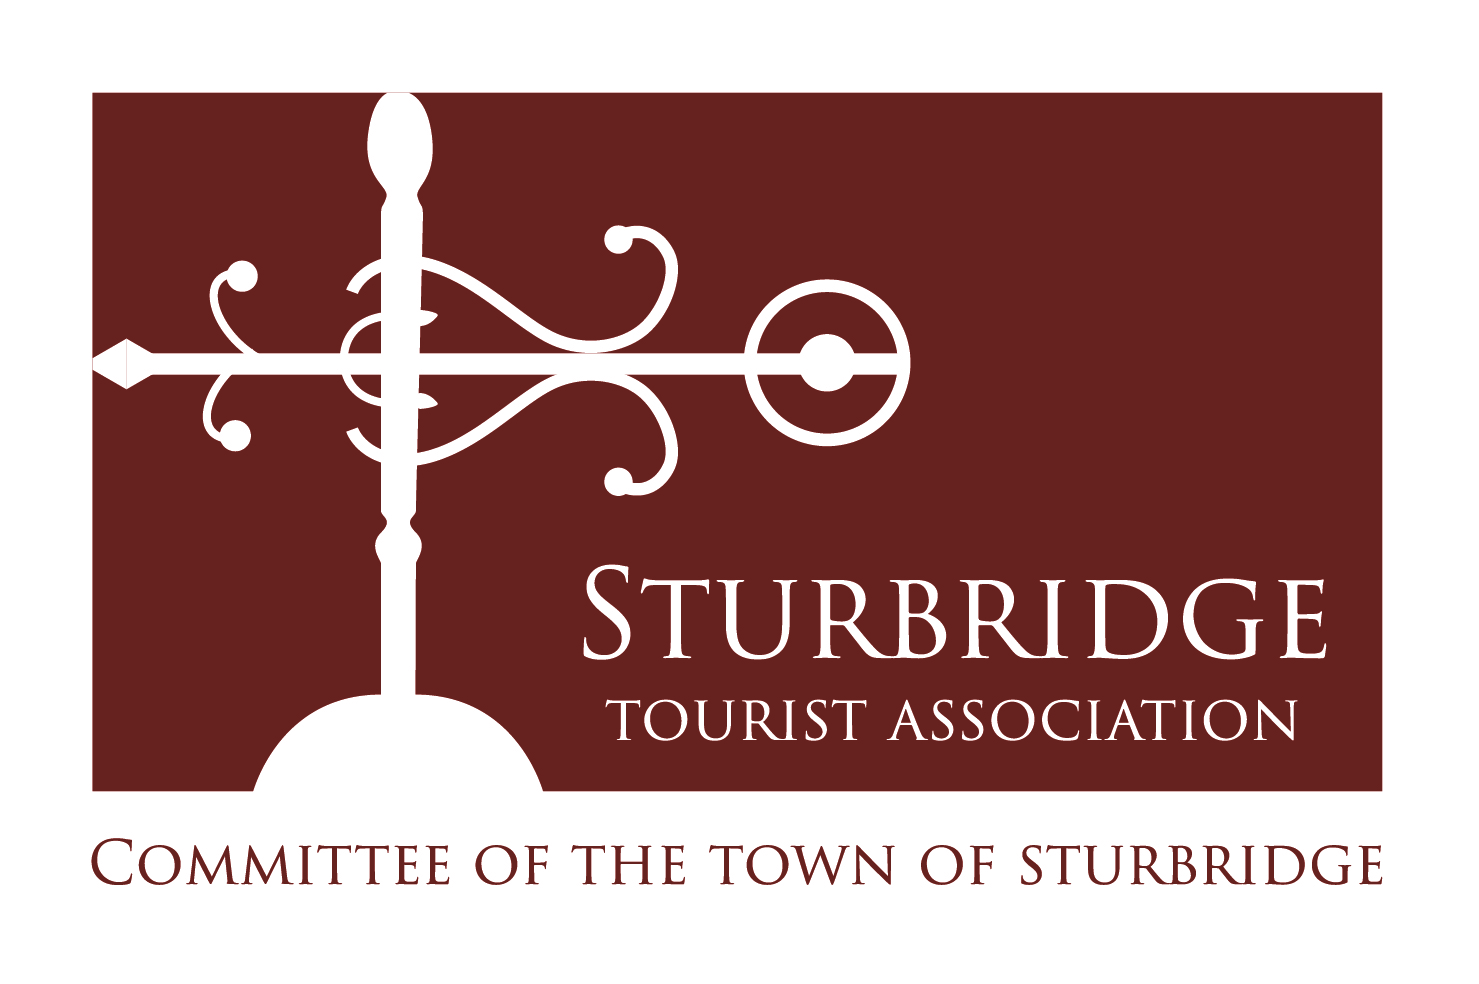 Sponsor Sturbridge Tourist Association